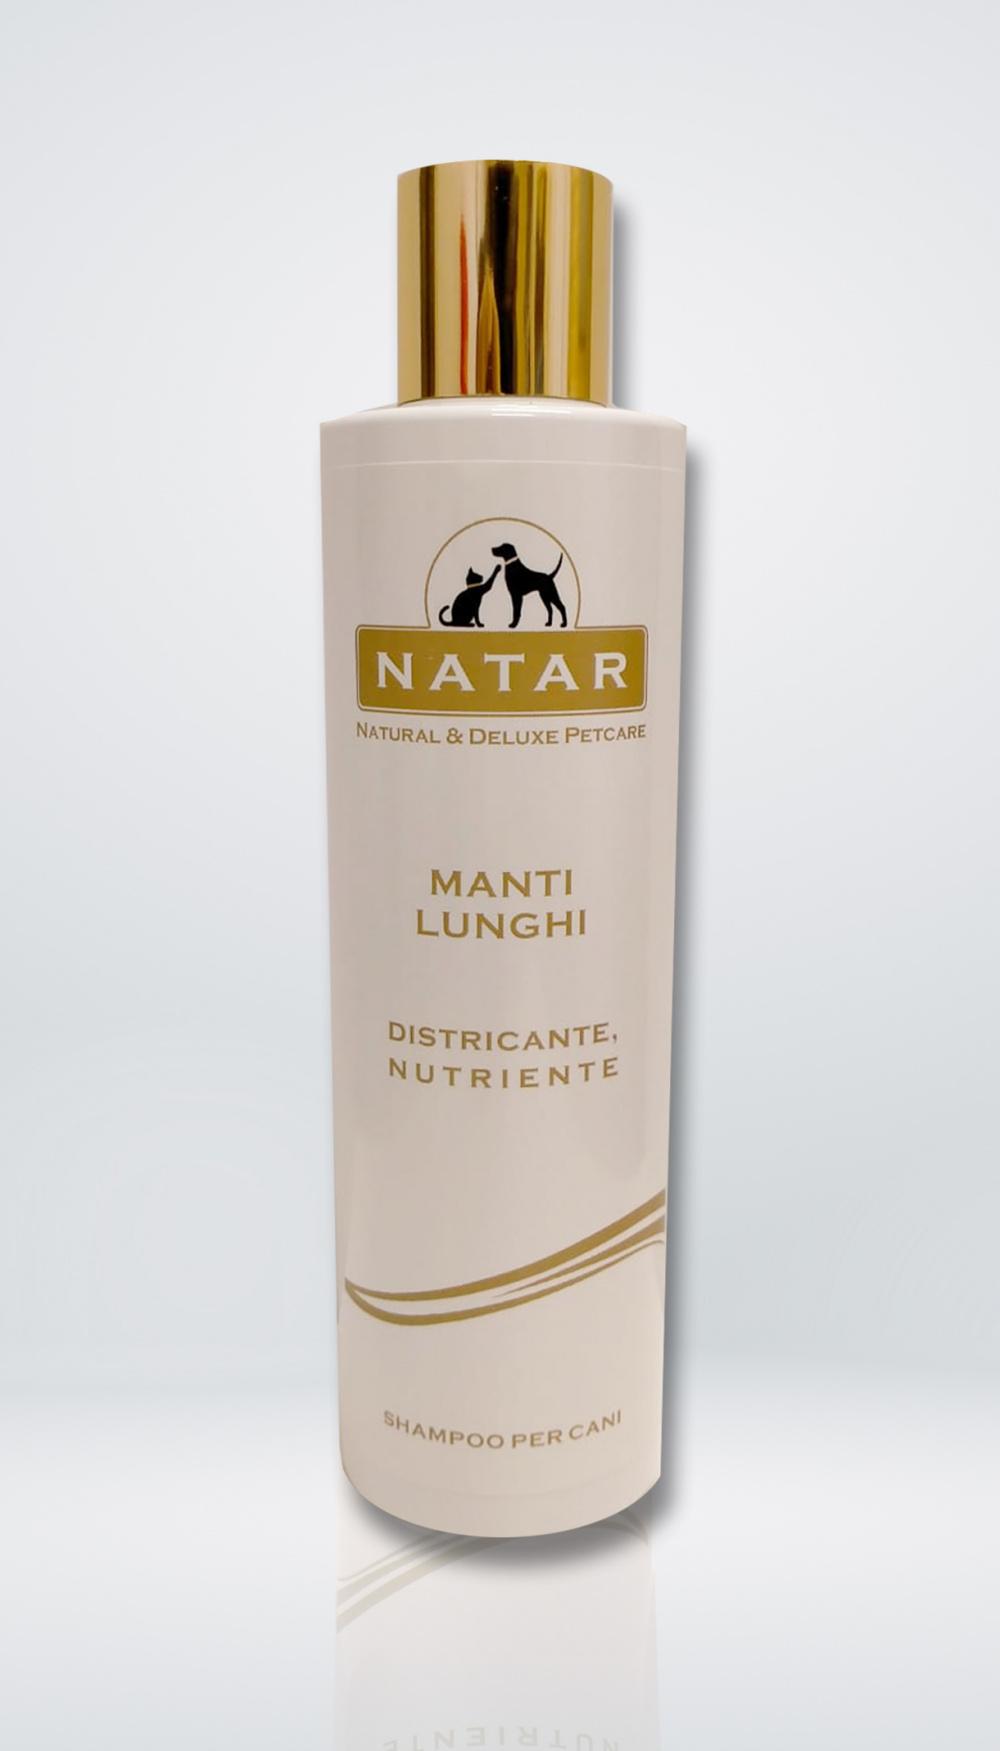 Natar Shampoo per Cani Manti Lunghi